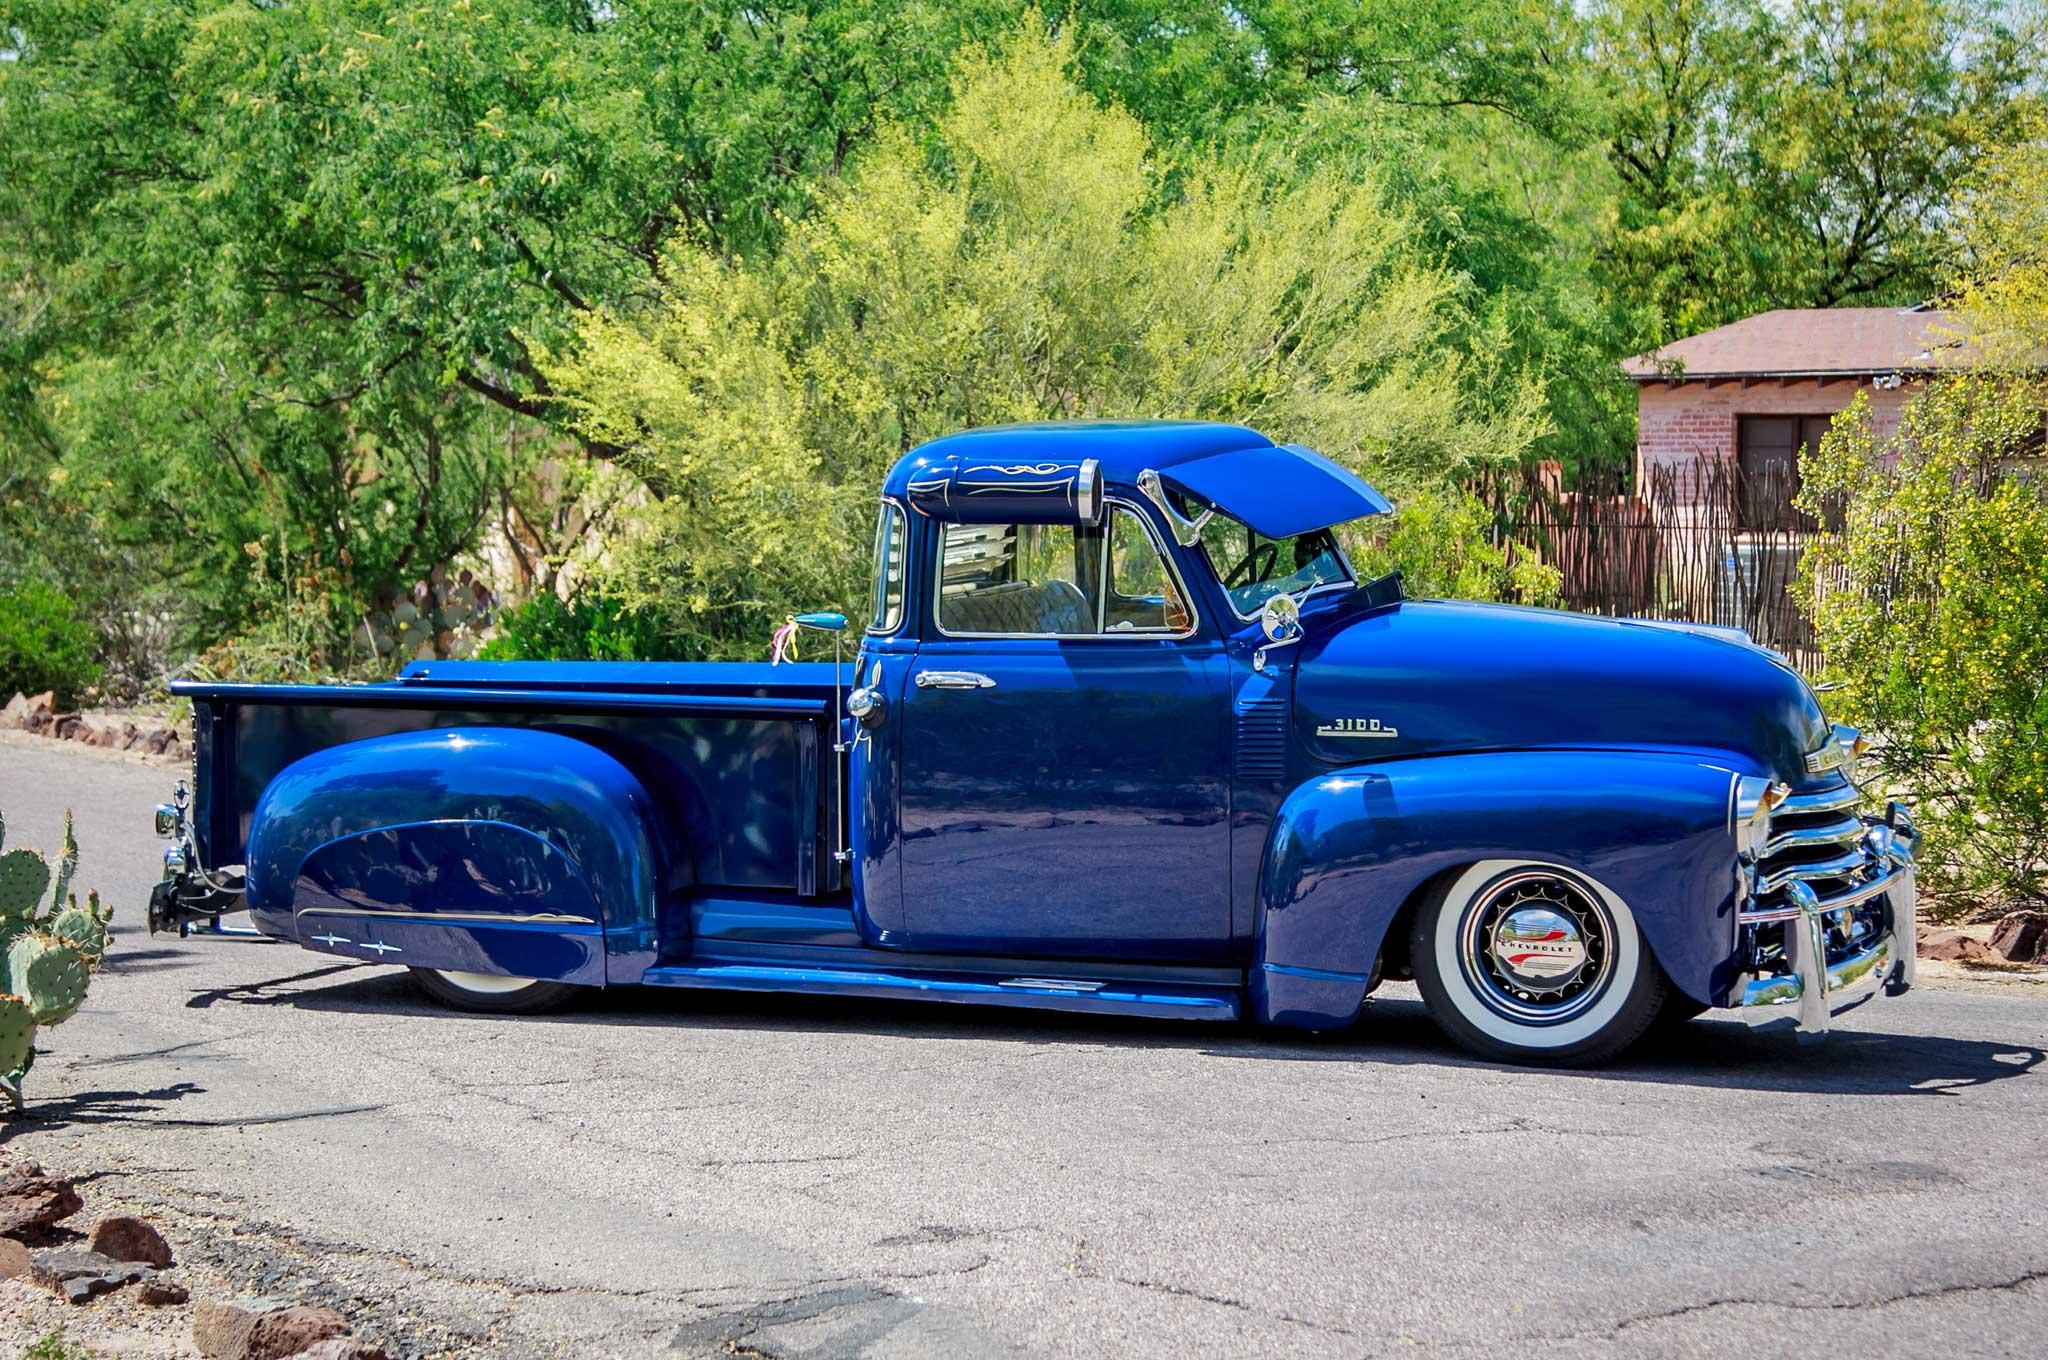 lowrider truck pickup chevrolet 1953 custom rod gangsta tuning rods trucks desktop passenger side vehicle month